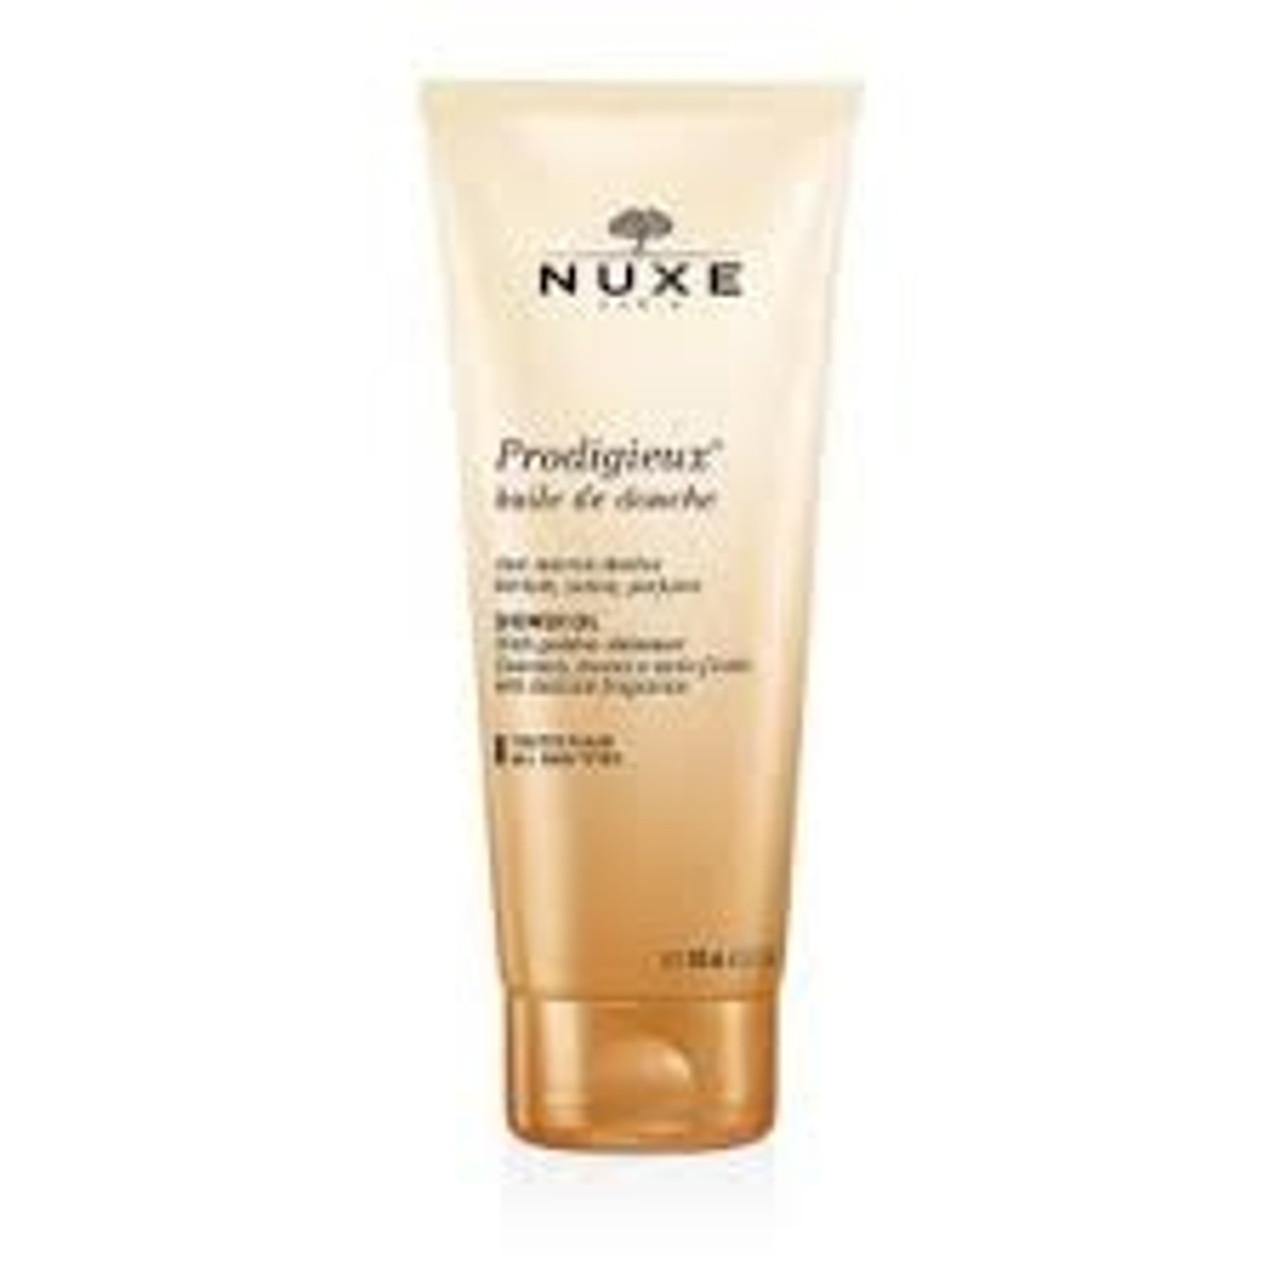 Nuxe Prodigieux Shower Oil 6.7 Fl Oz 200mL